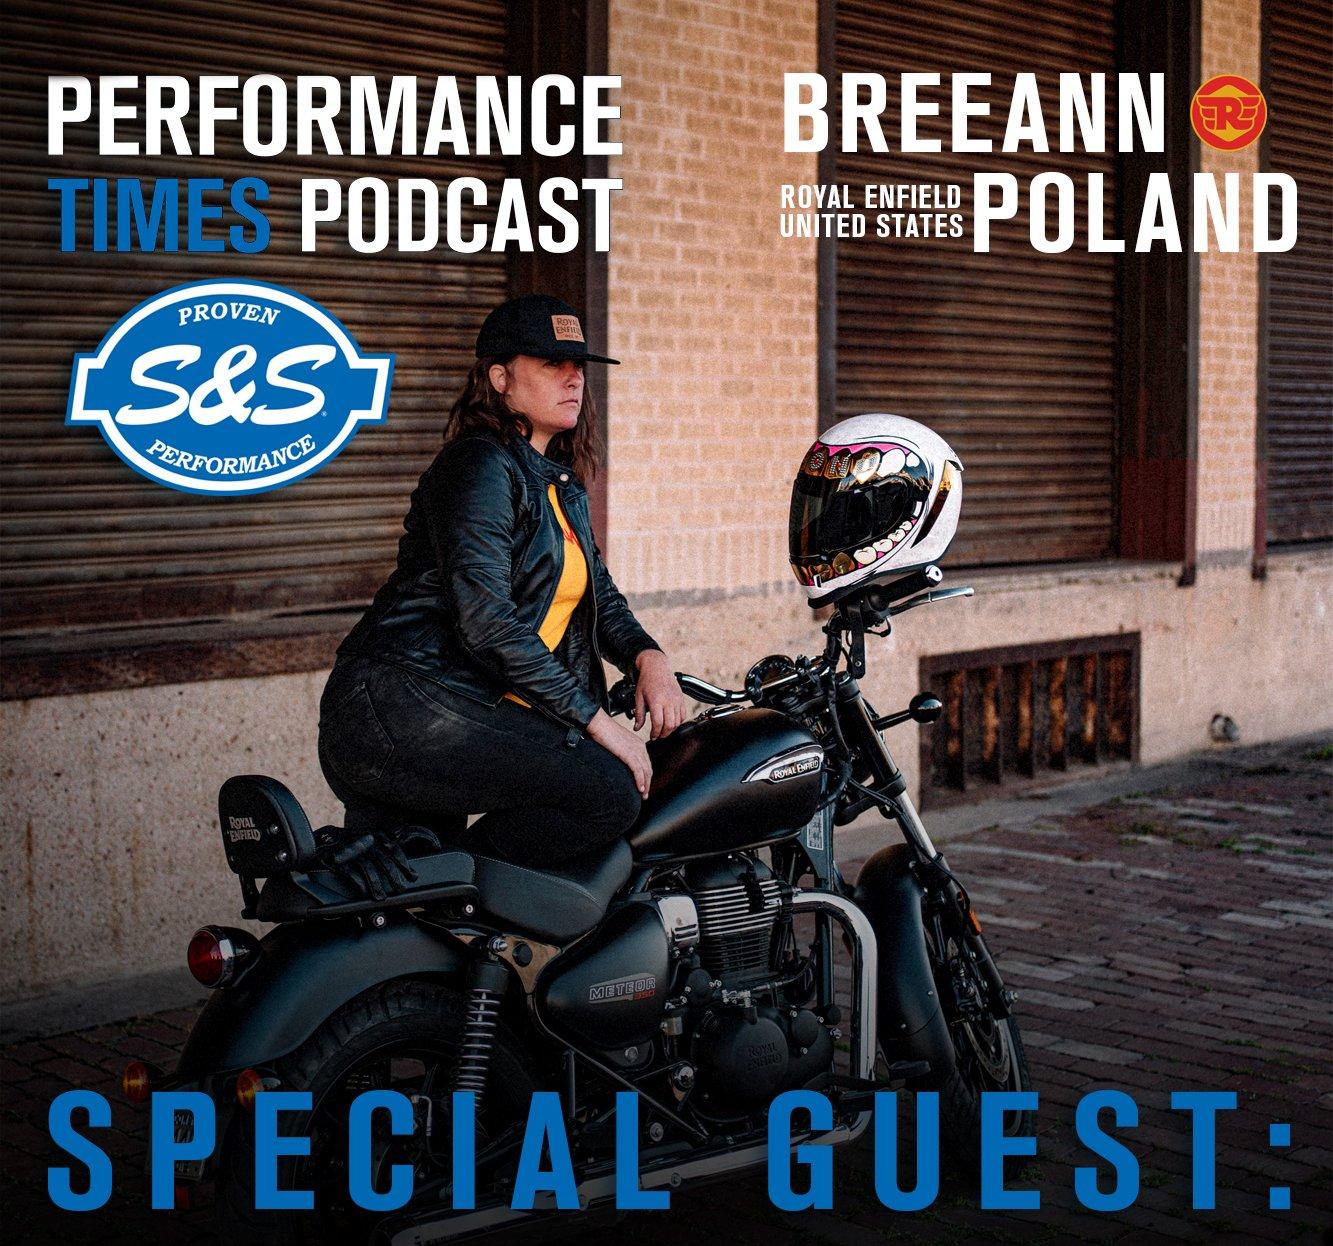 breann poland podcast graphic copy